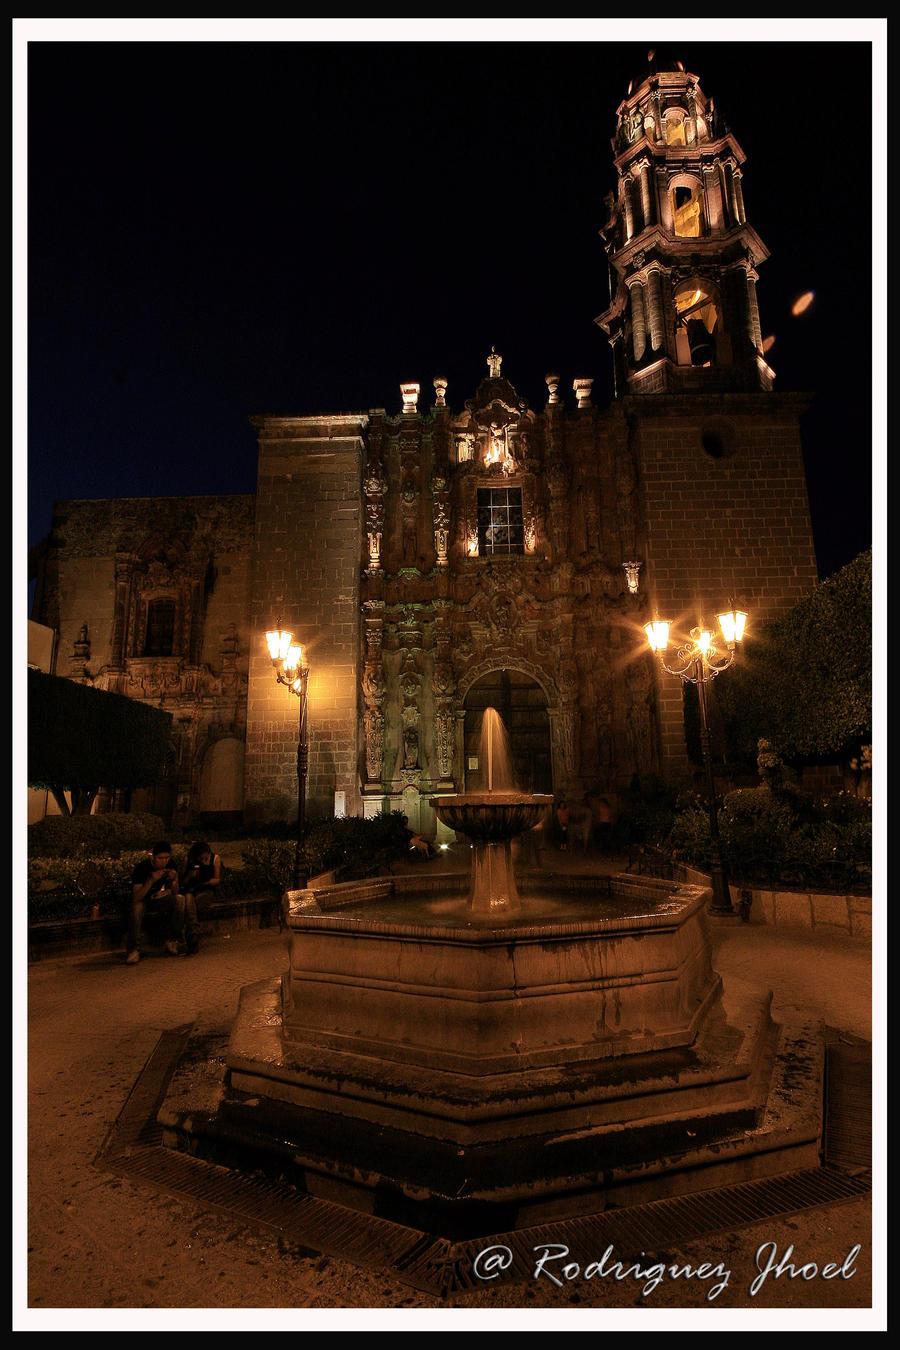 san miguel de allende hindu dating site San miguel de allende is a unesco world heritage site and one of mexico's pueblos mágicos, or magic towns yuri cortez/afp/getty images.